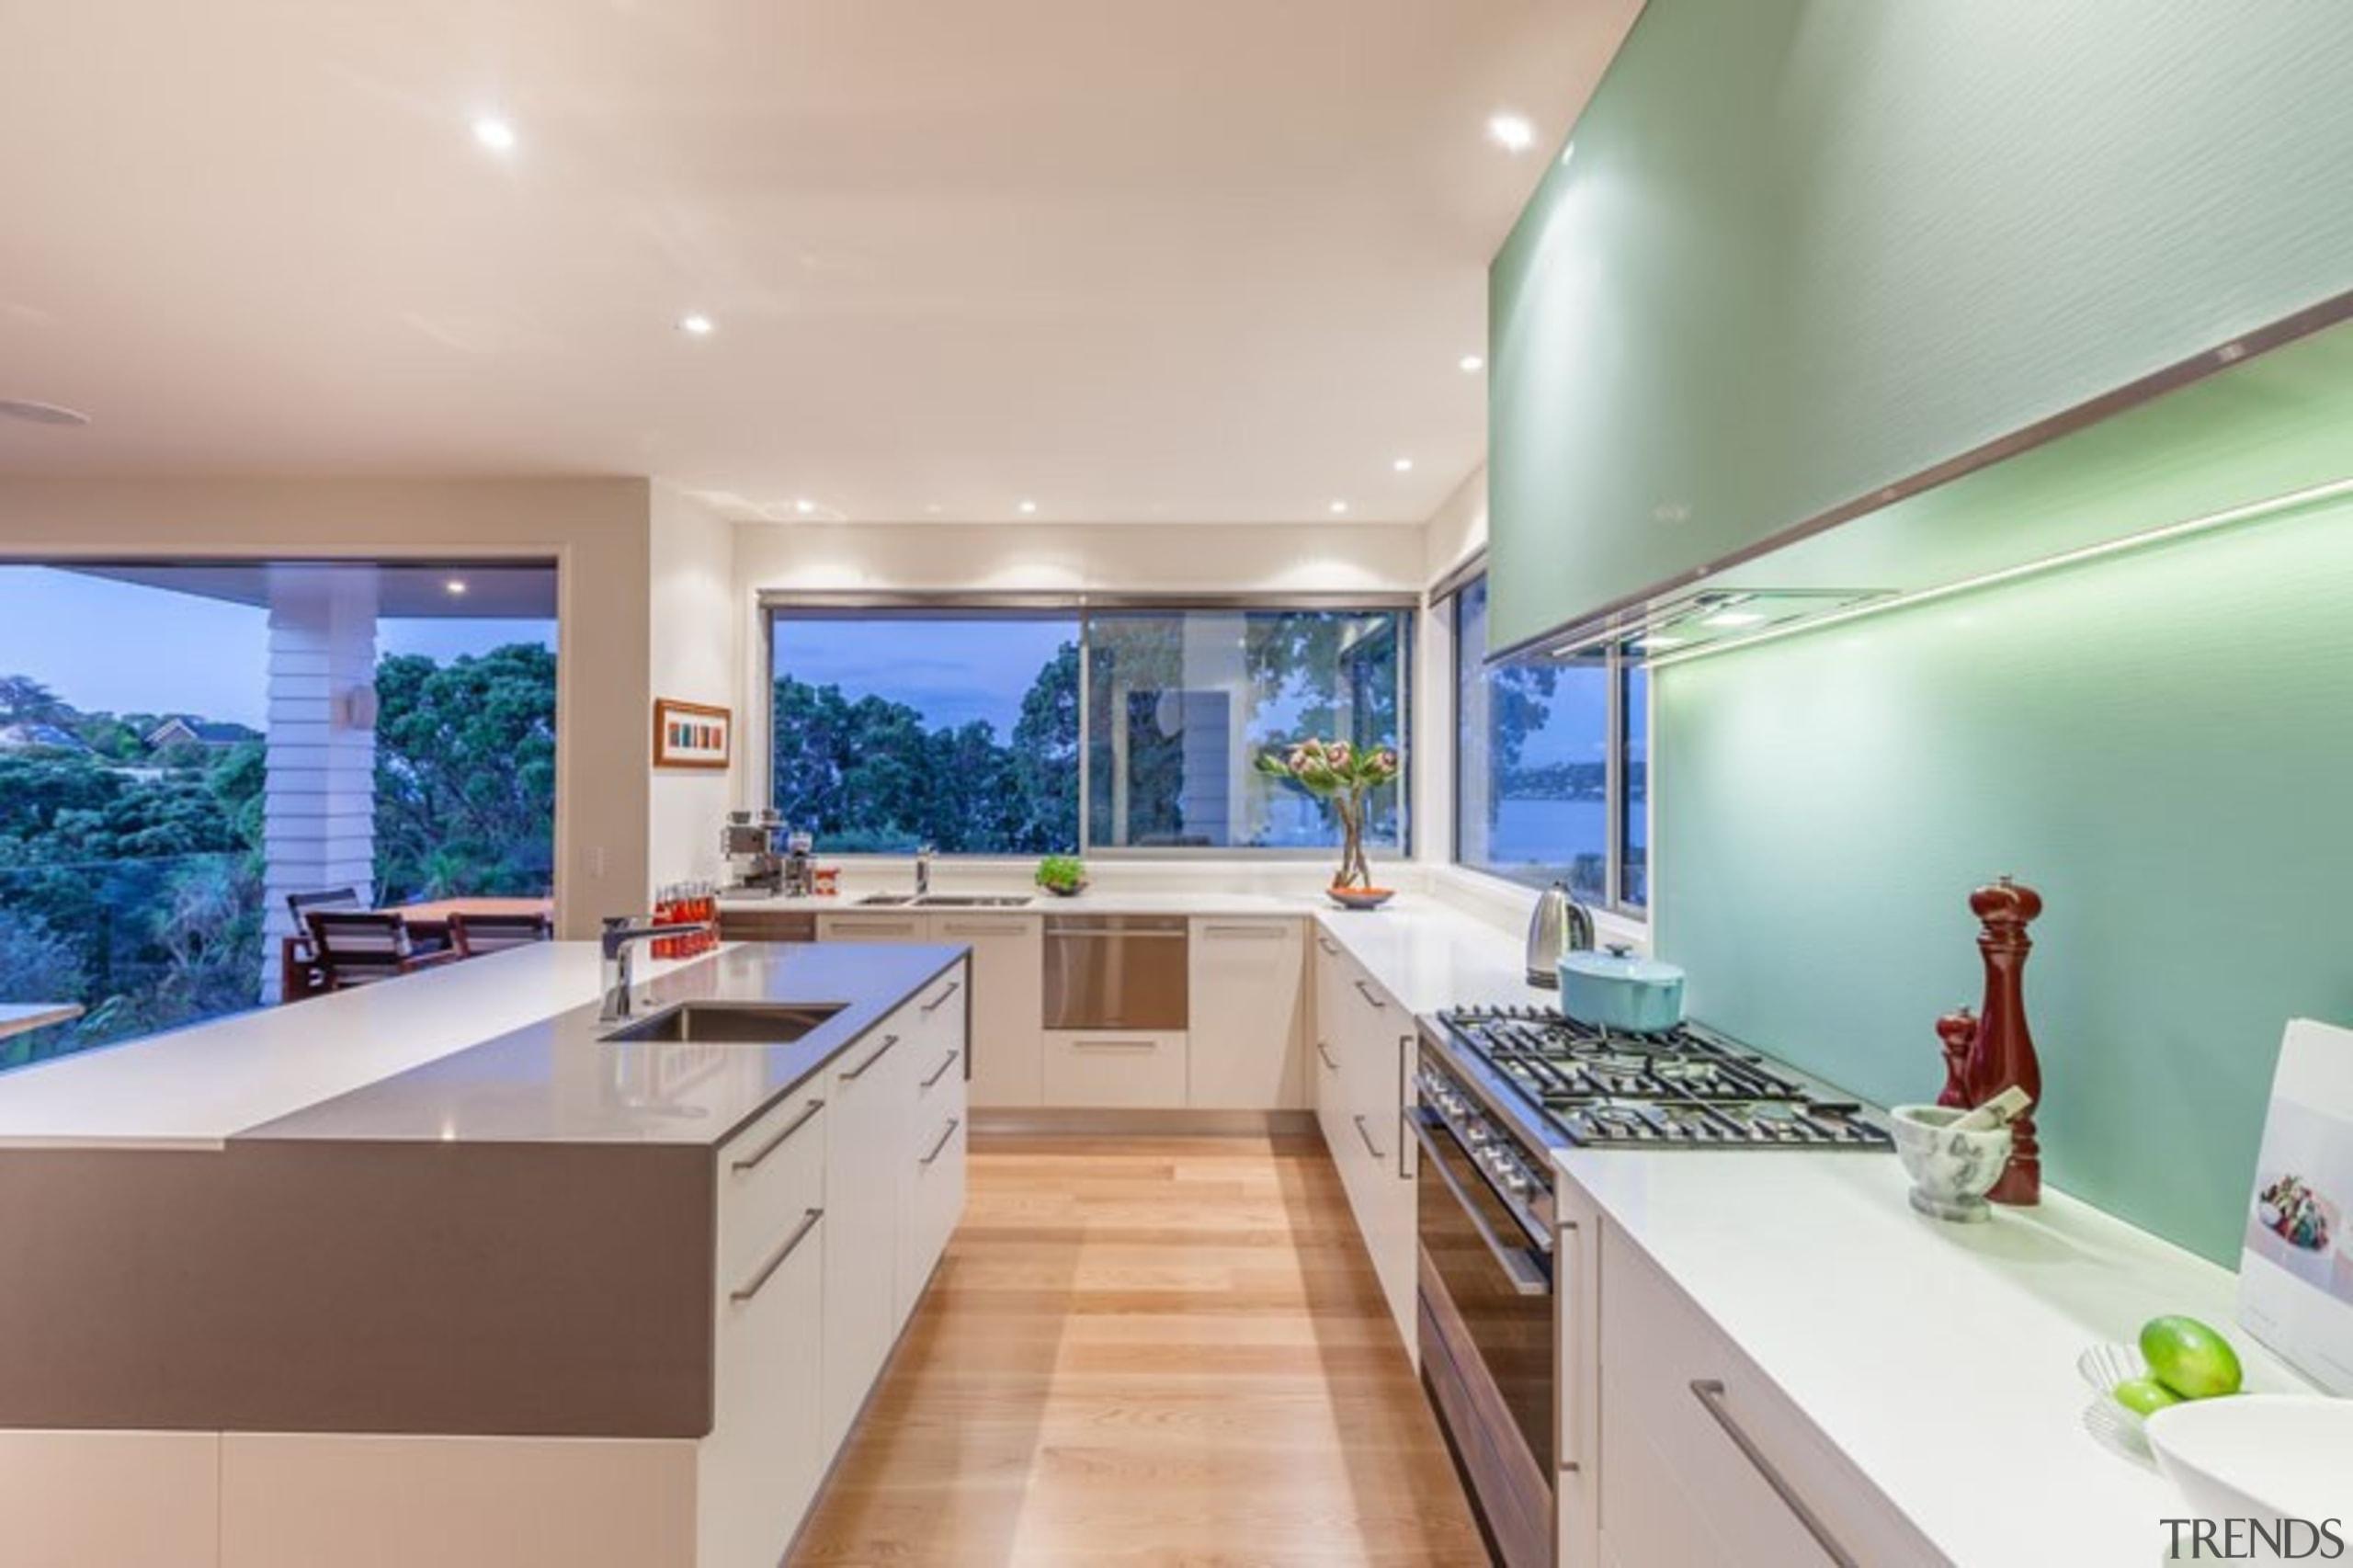 Tropical Kitchen - Tropical Kitchen - countertop | countertop, estate, interior design, kitchen, real estate, gray